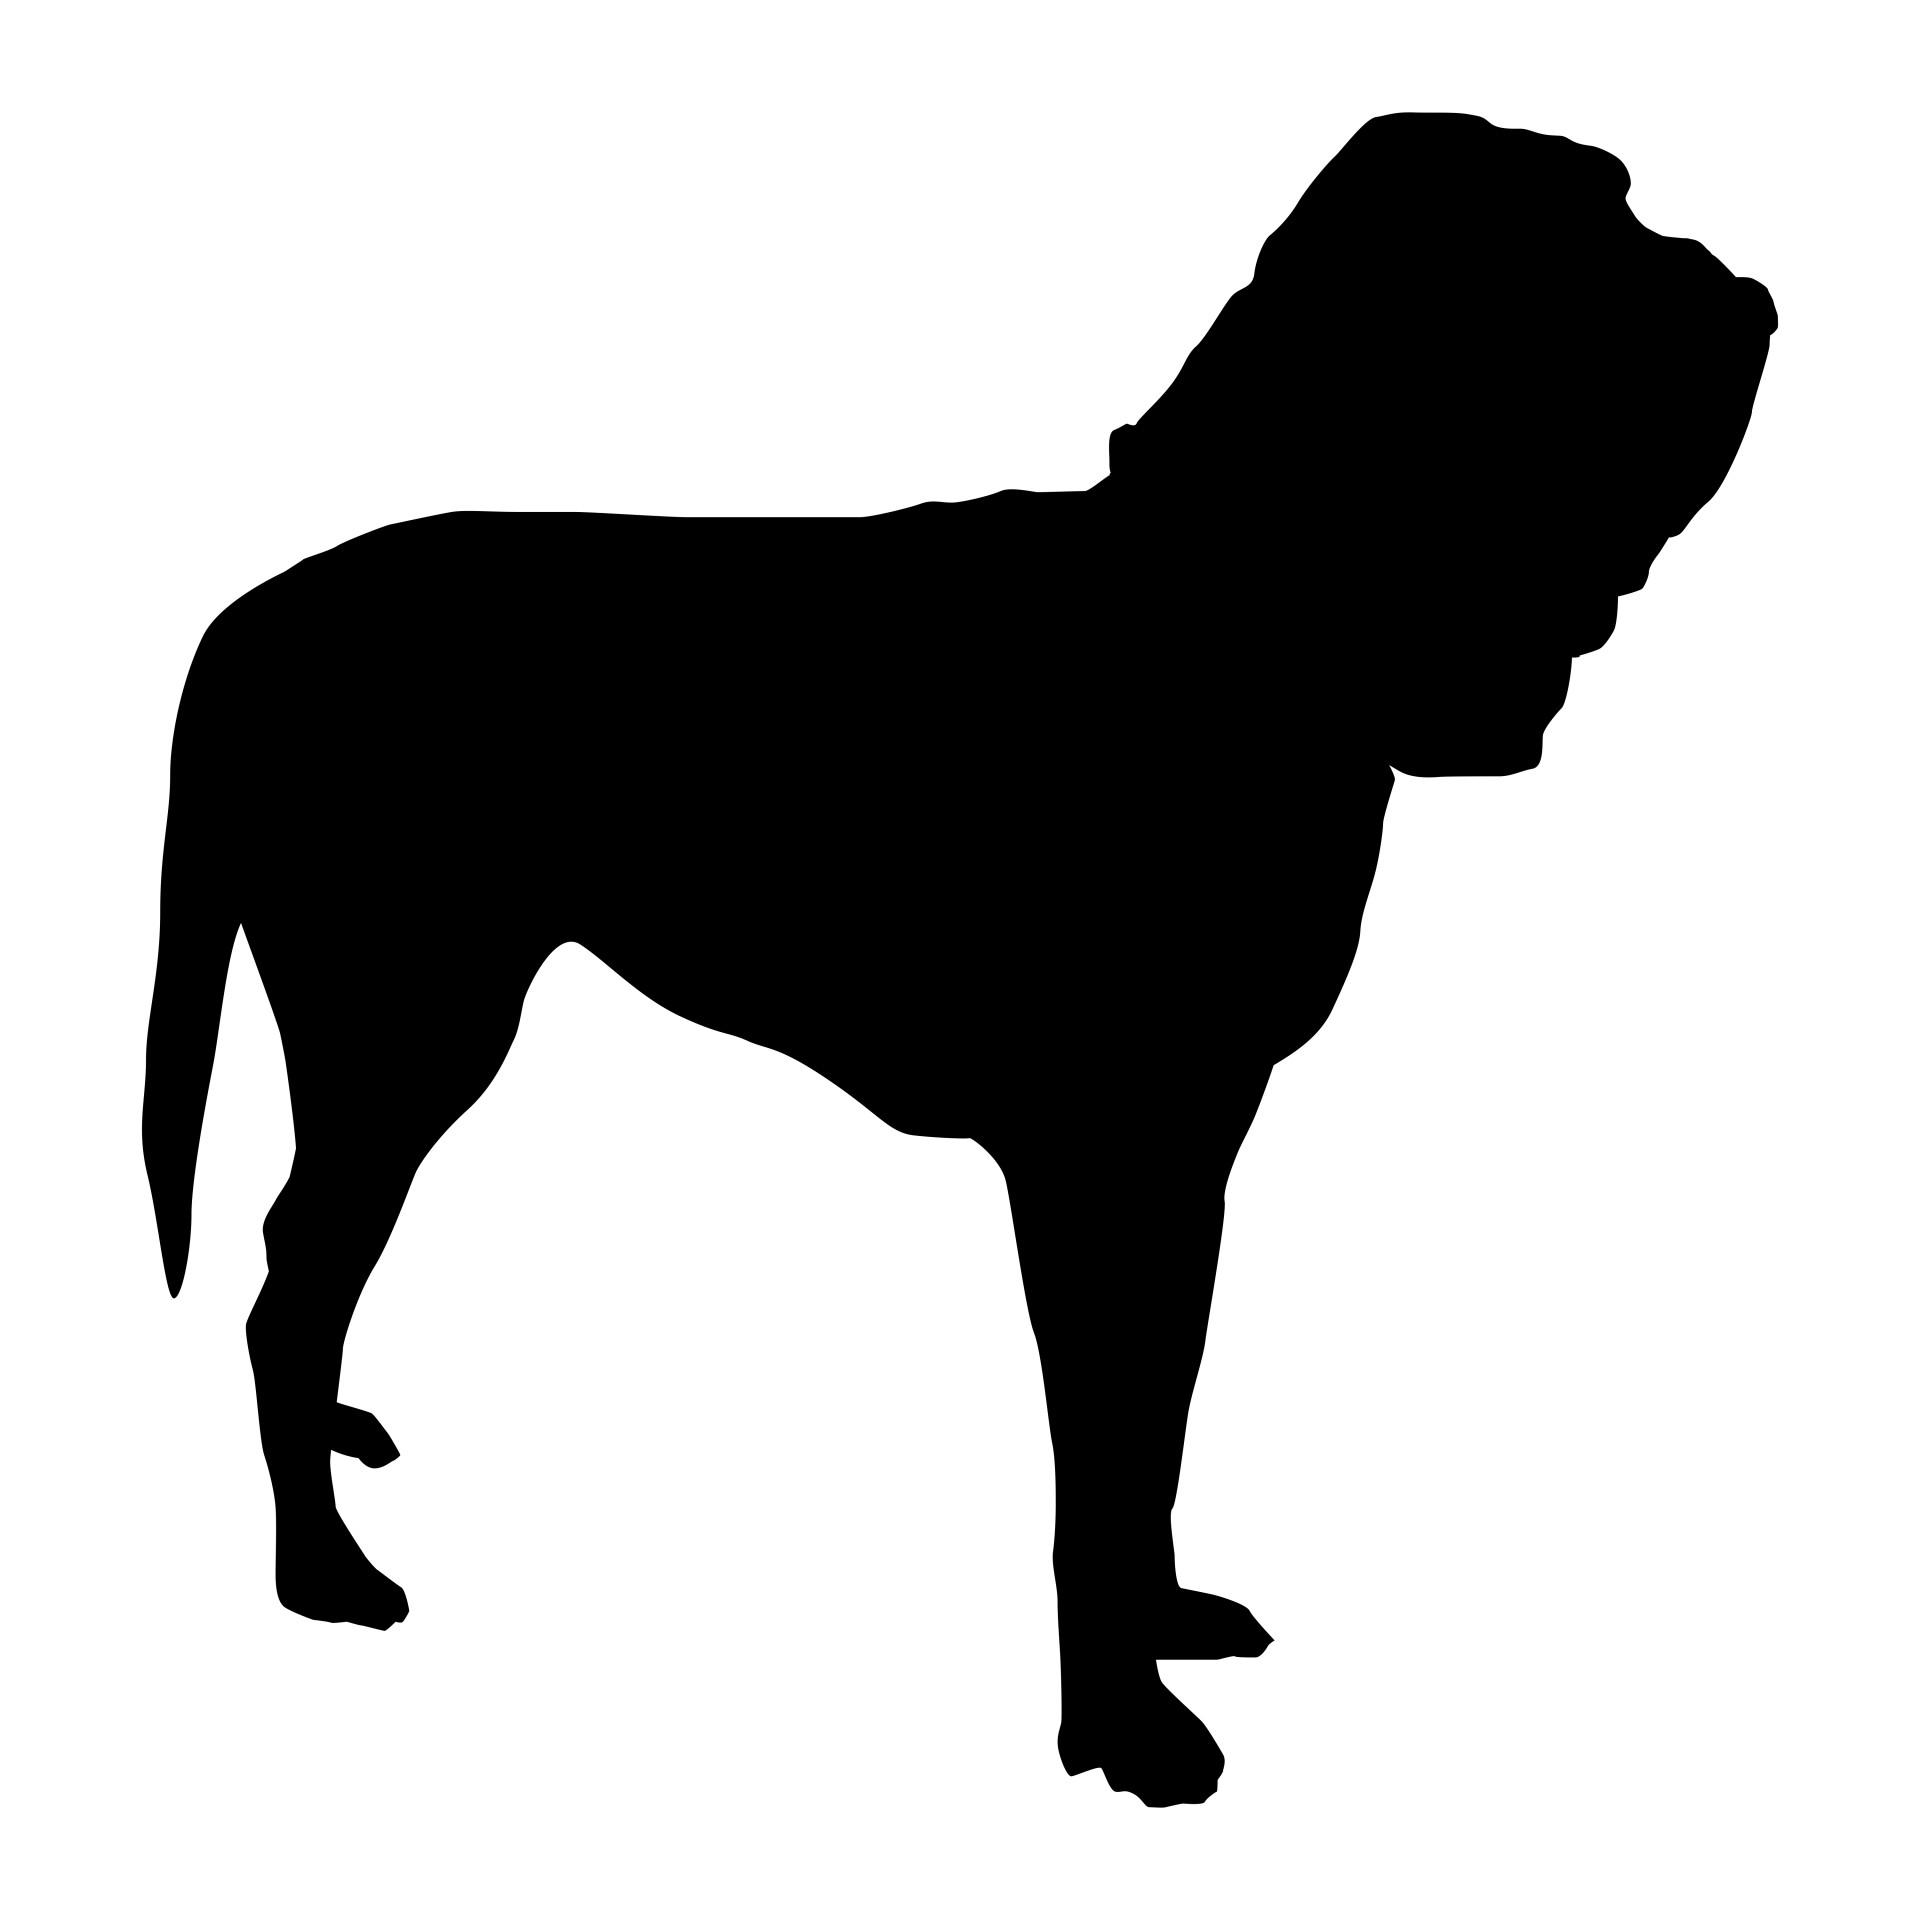 Bloodhound,coursing,sleuth,black,illustration.